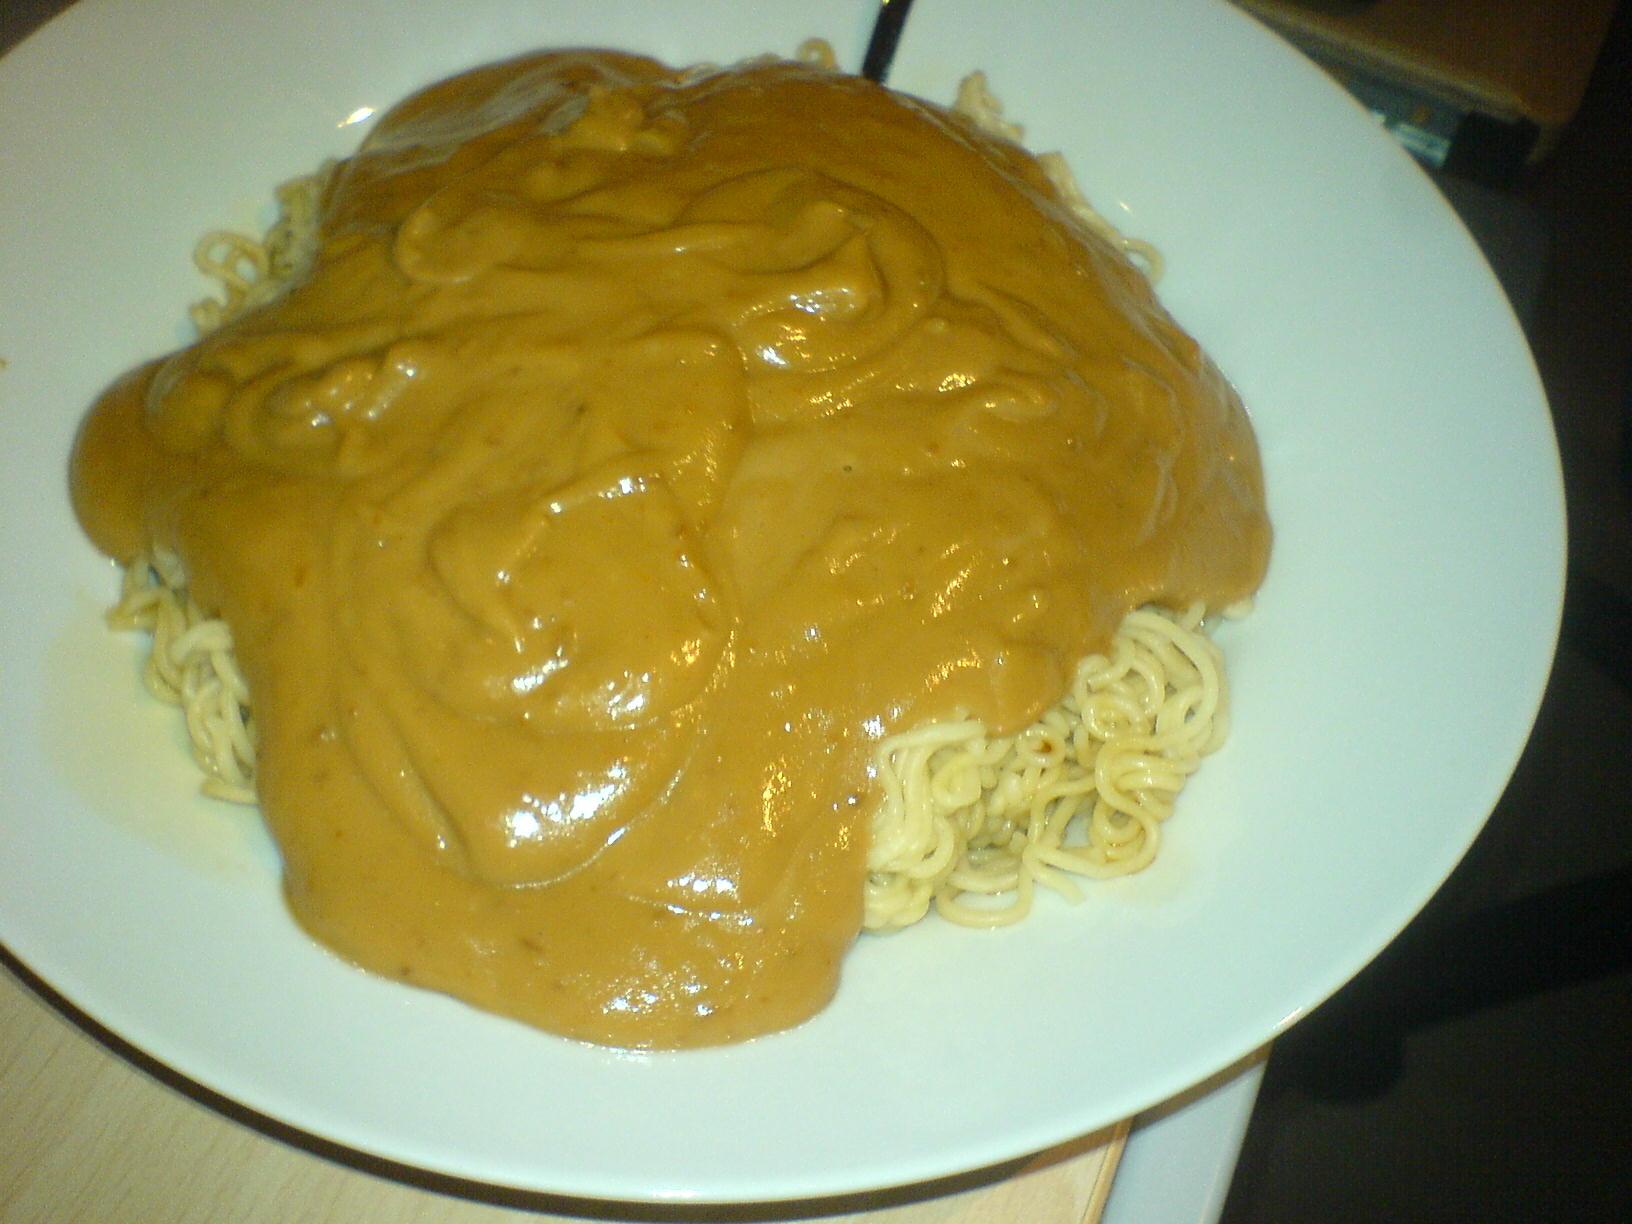 https://foodloader.net/Holz_2009-08-26_Asianudeln_in_Satesauce.jpg